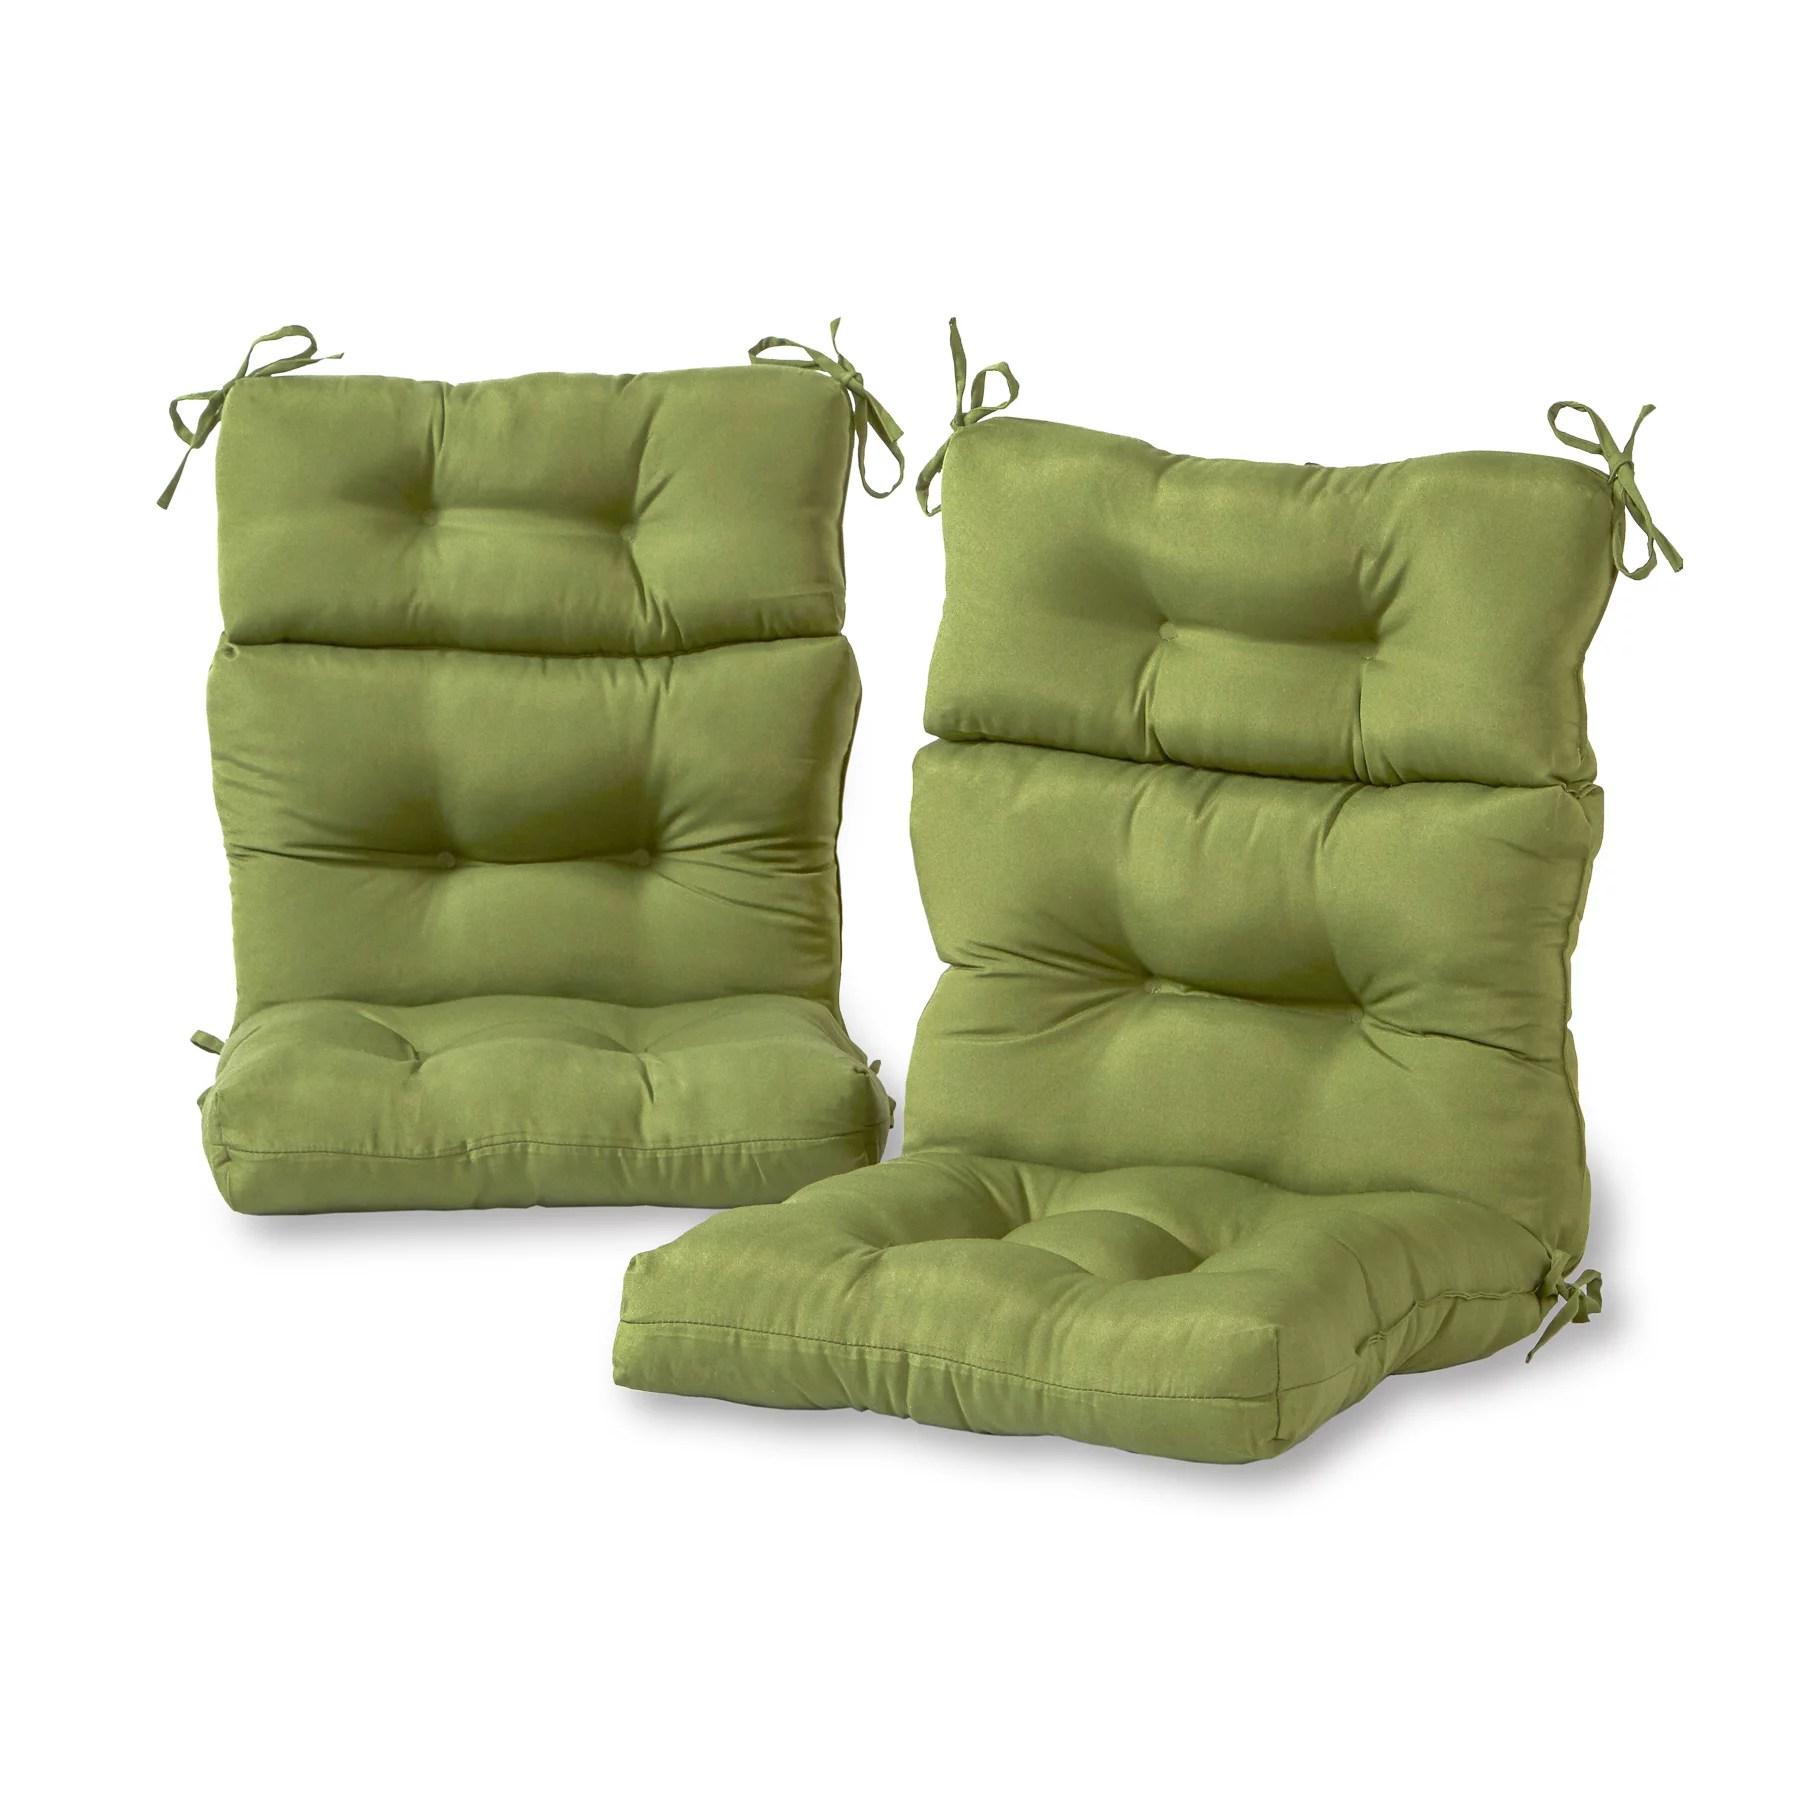 greendale home fashions solid outdoor high back chair cushion set of 2 walmart com walmart com